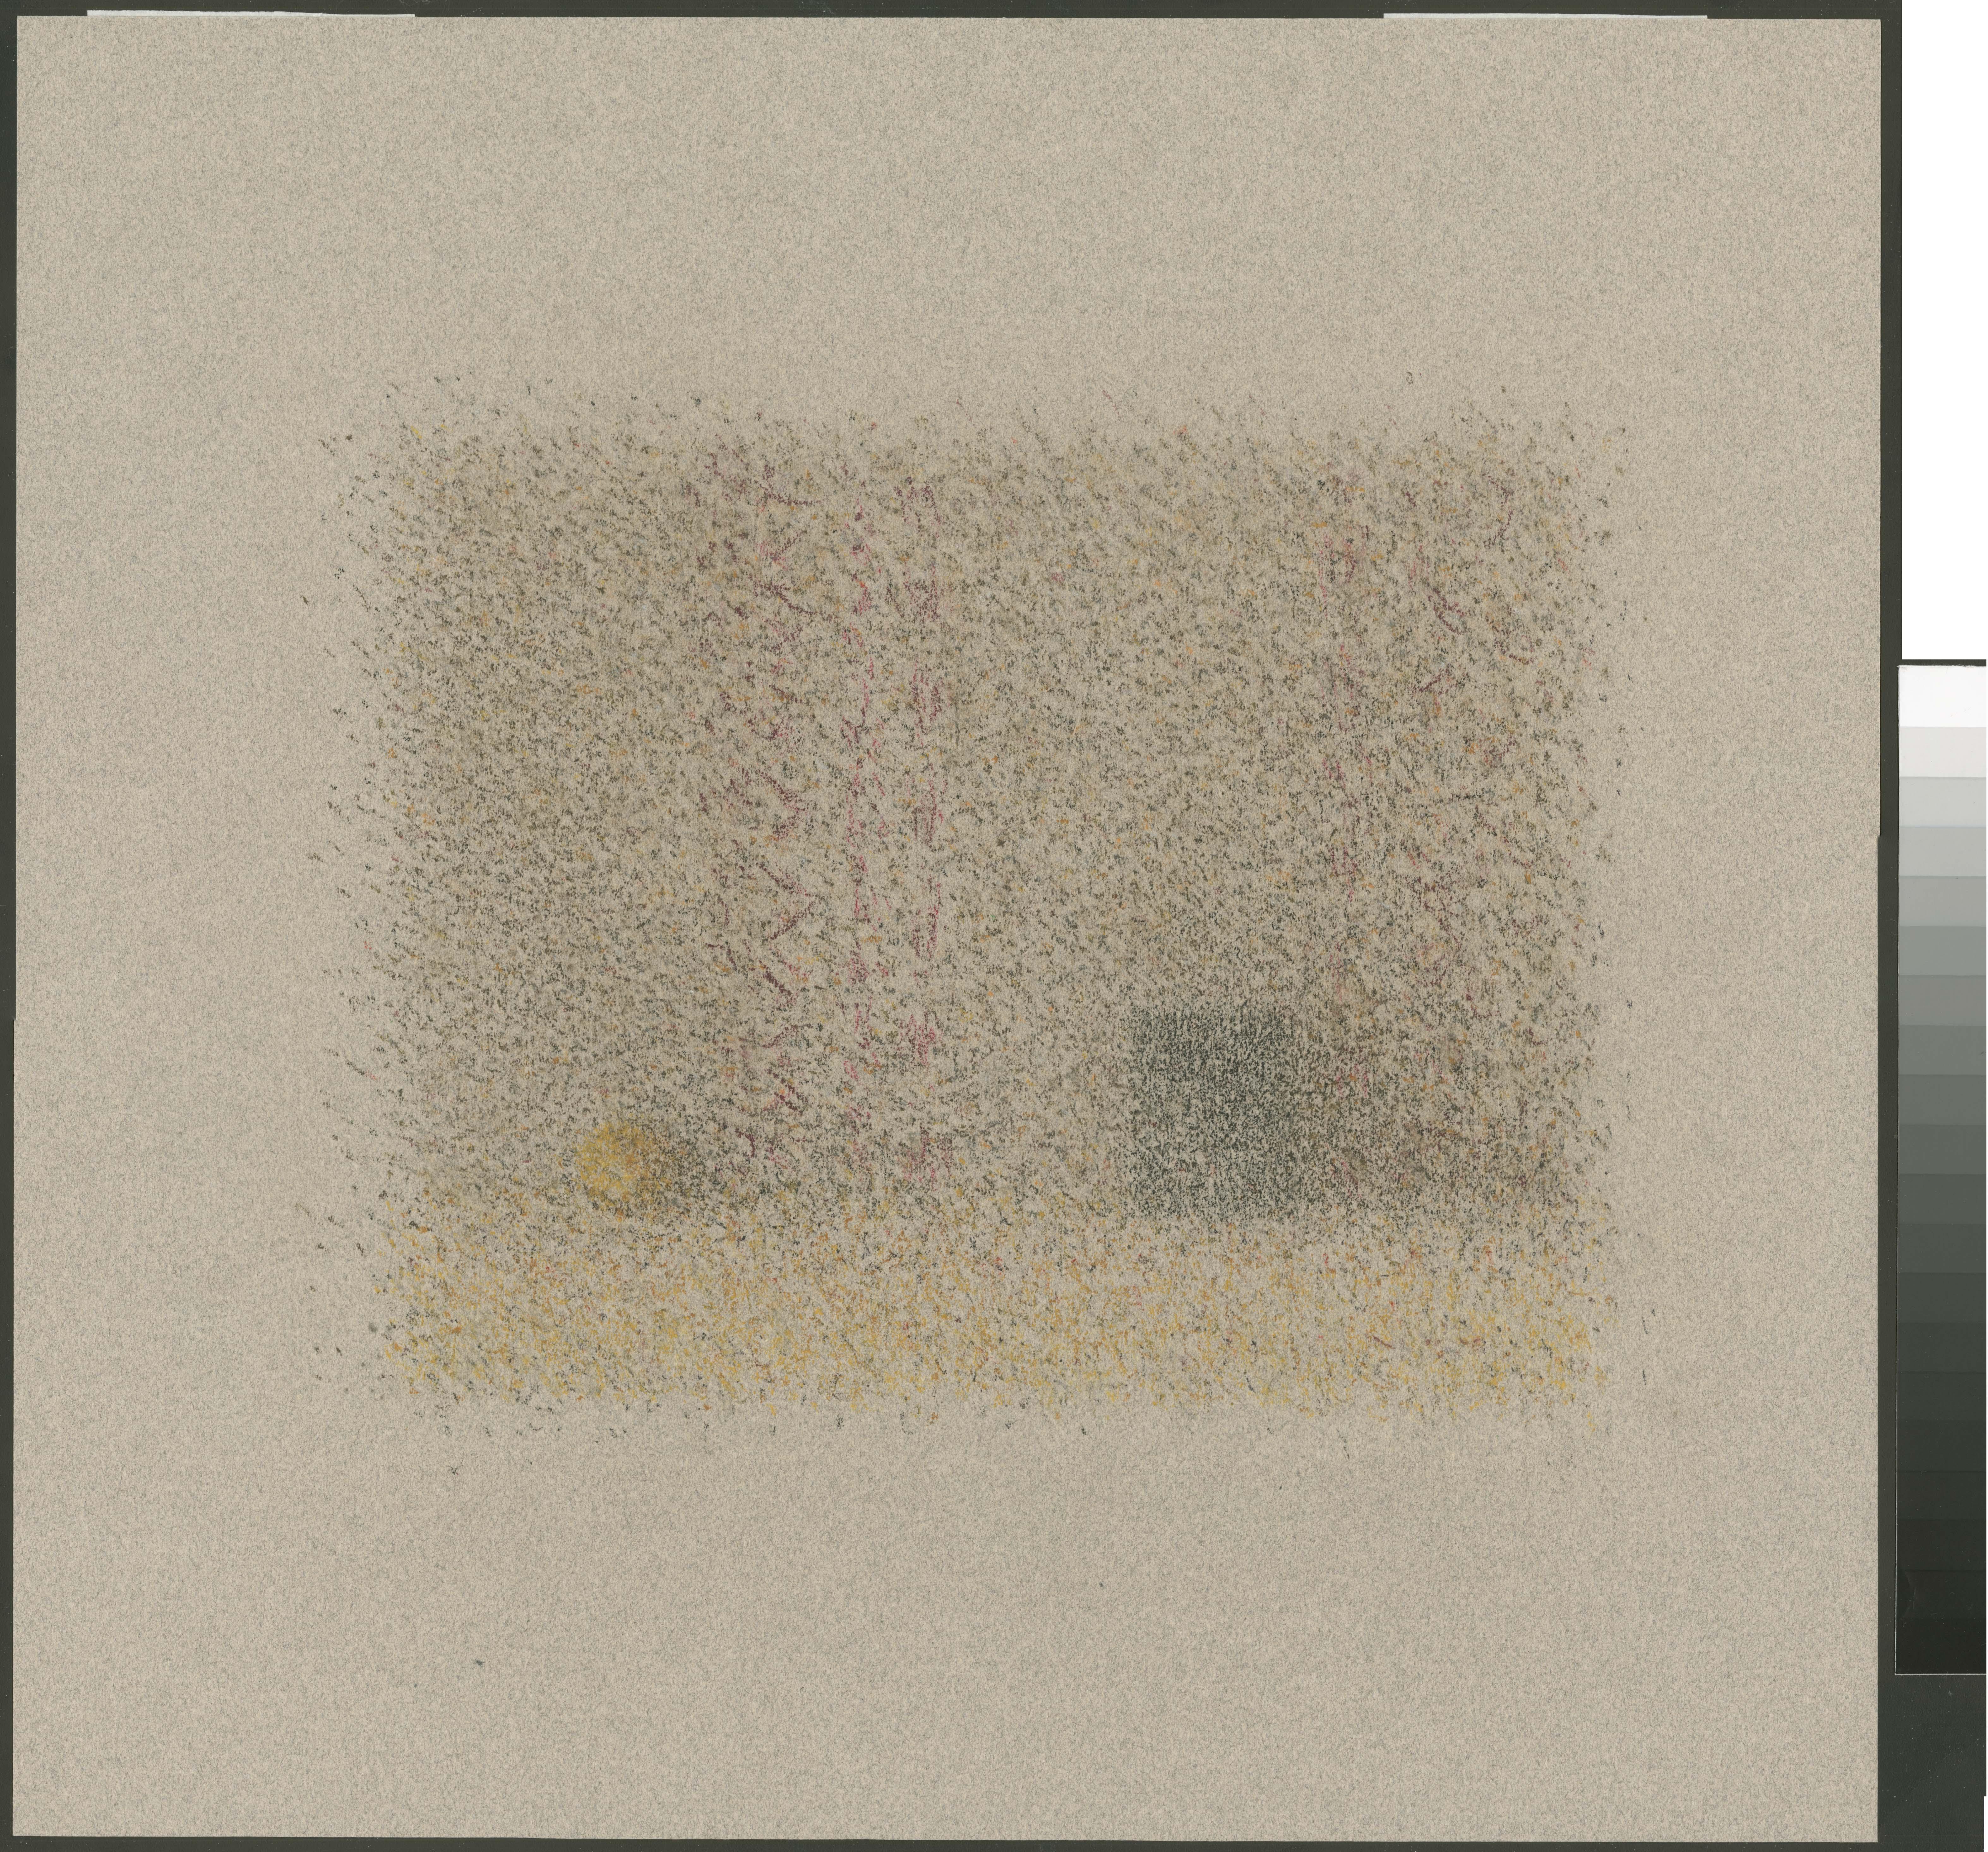 Pastel 22 x 27 cm 1989